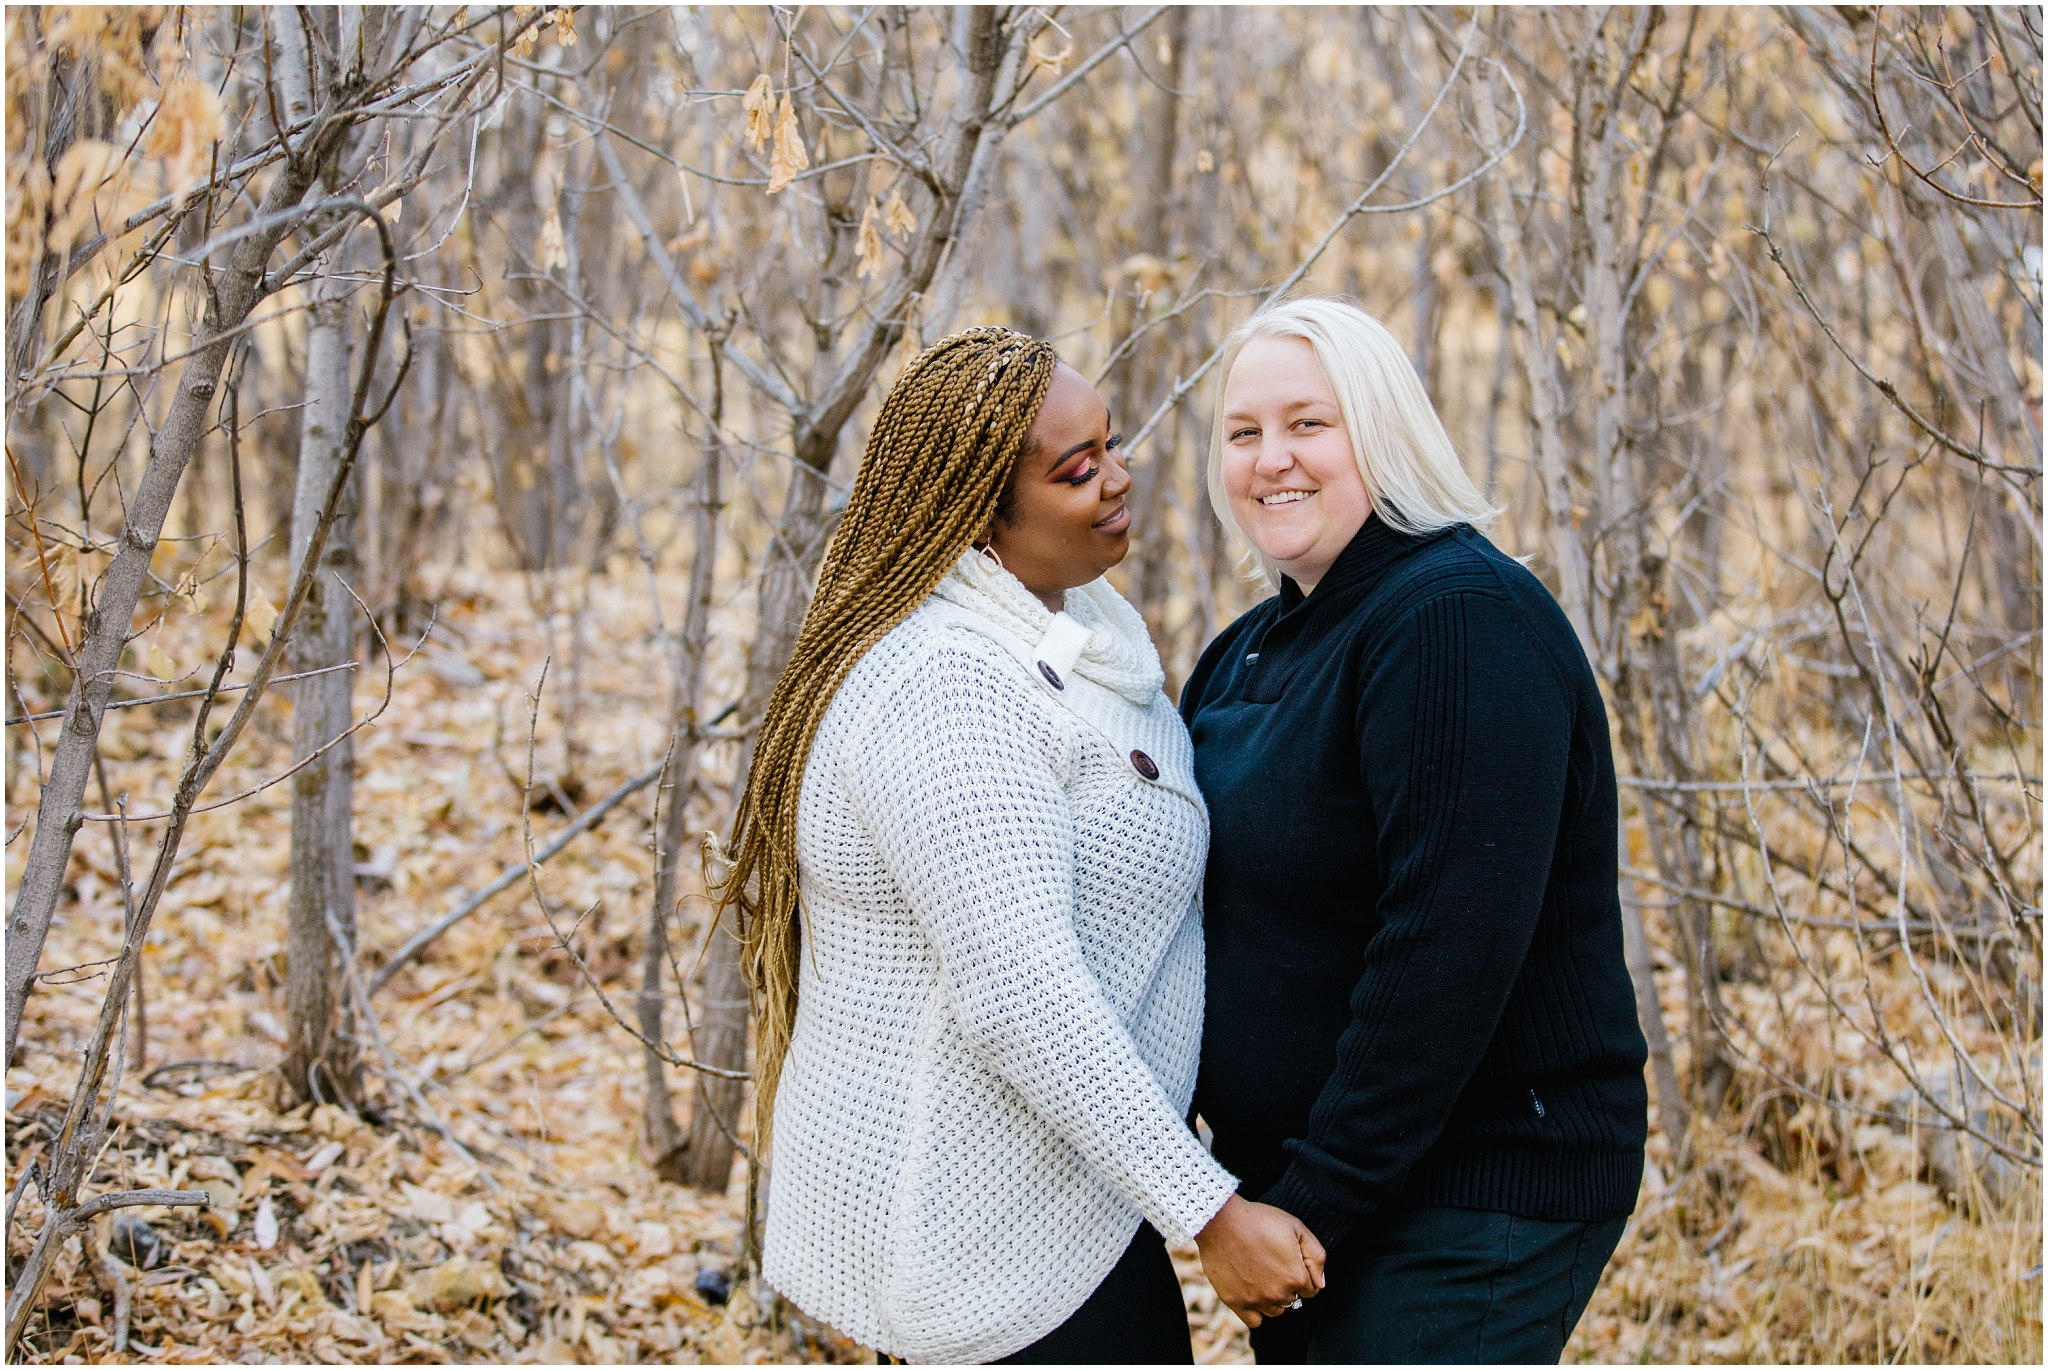 LisaTiffany2018-26_Lizzie-B-Imagery-Utah-Family-Photographer-Salt-Lake-City-Park-City-Miners-Hospital-Community-Center.jpg